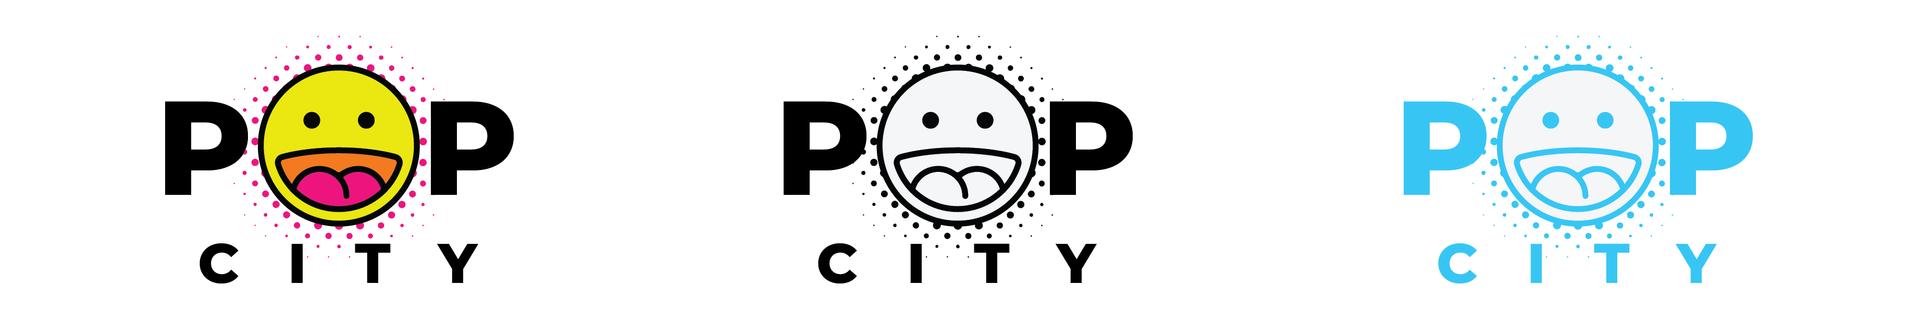 popcityartboard-29-2x_orig.png